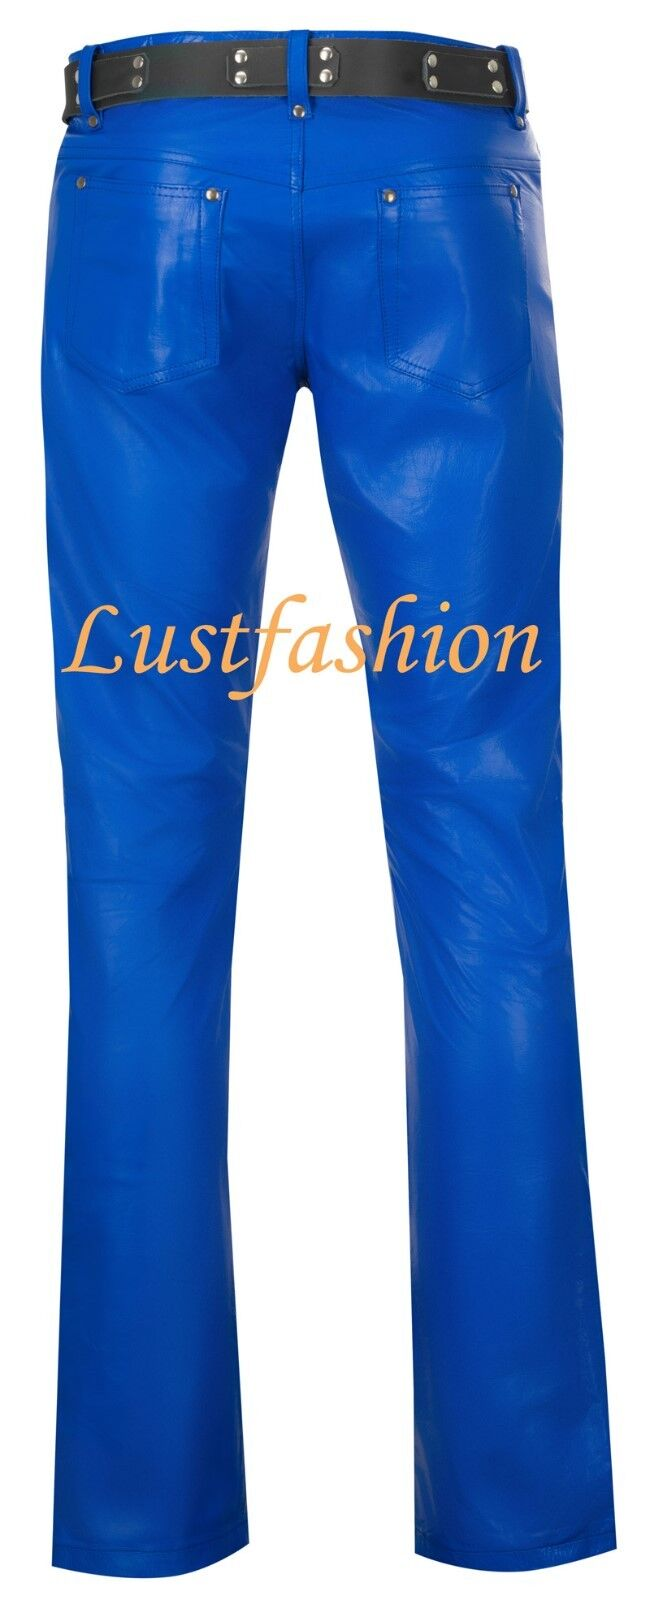 LEDERHOSE blau Lederjeans royalblau neu neu neu  leather trousers pants Blau Cuir Pelle | Ausgezeichneter Wert  1c63a3